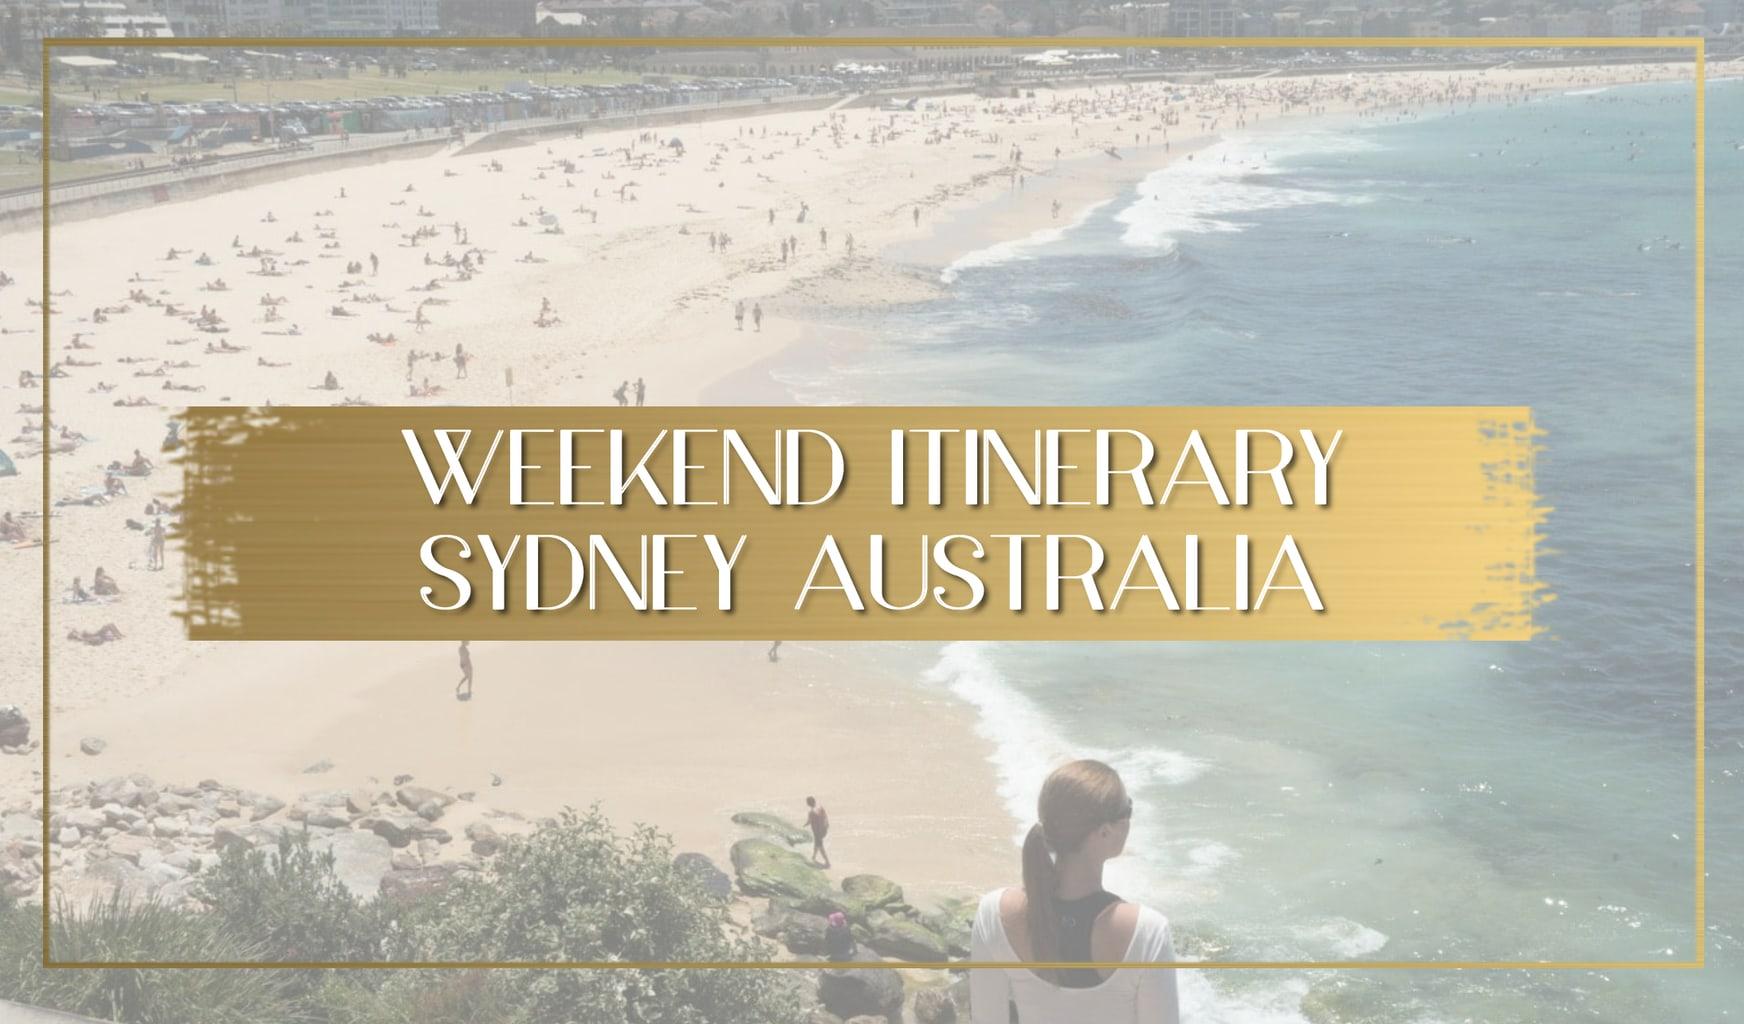 Weekend itinerary Sydney Australia main